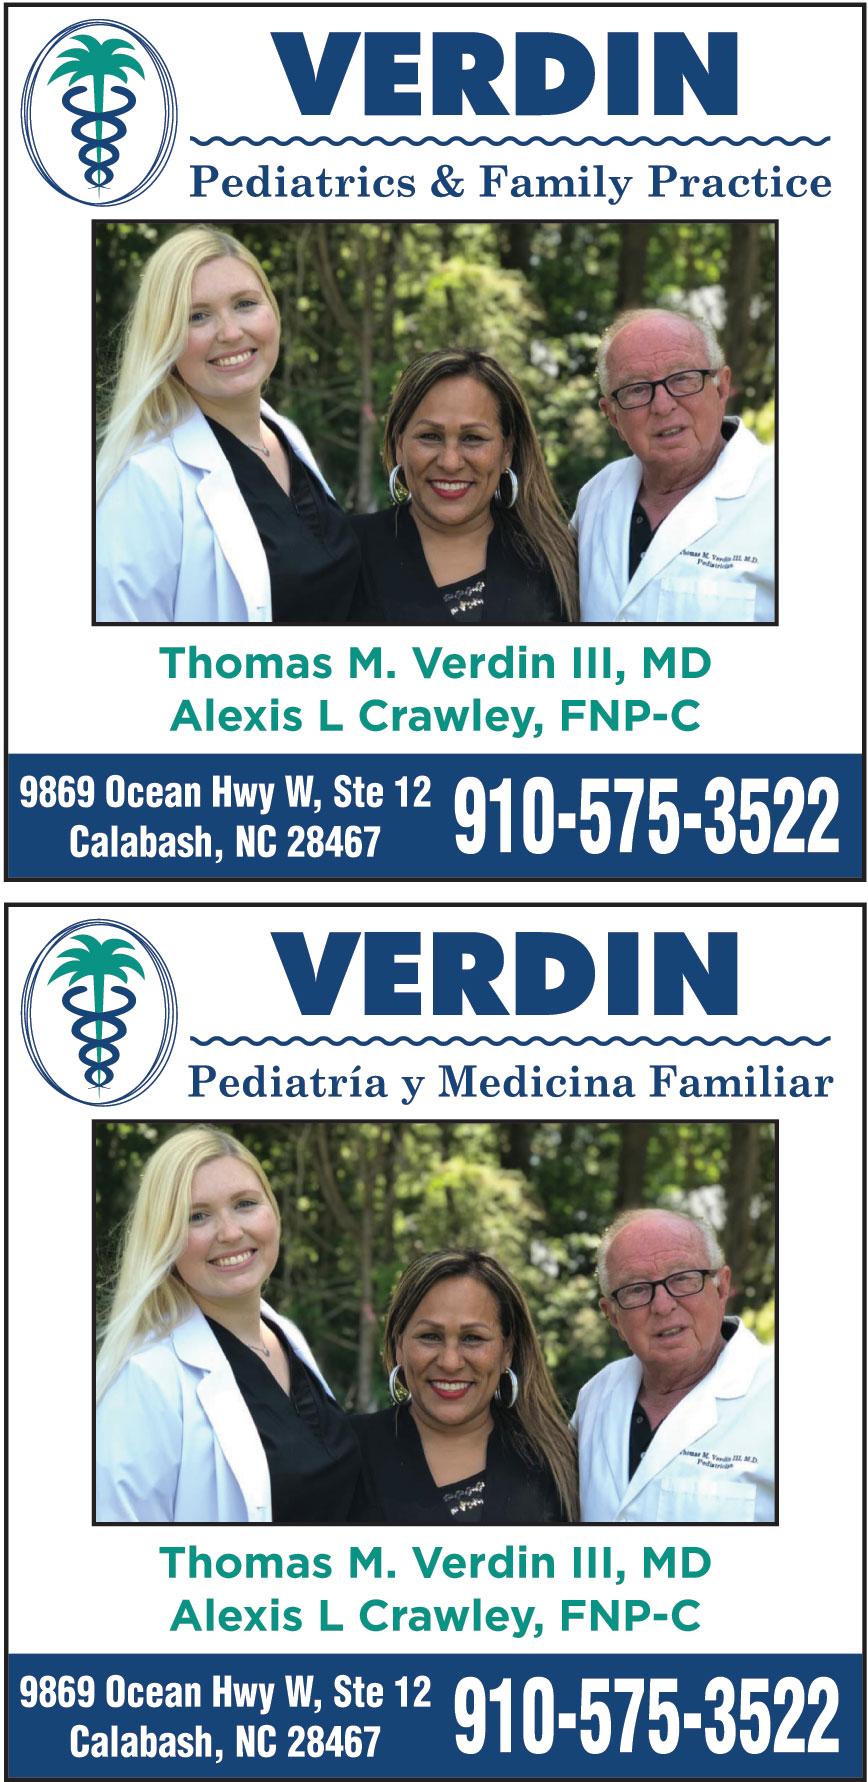 VERDIN PEDIATRICS AND FAM